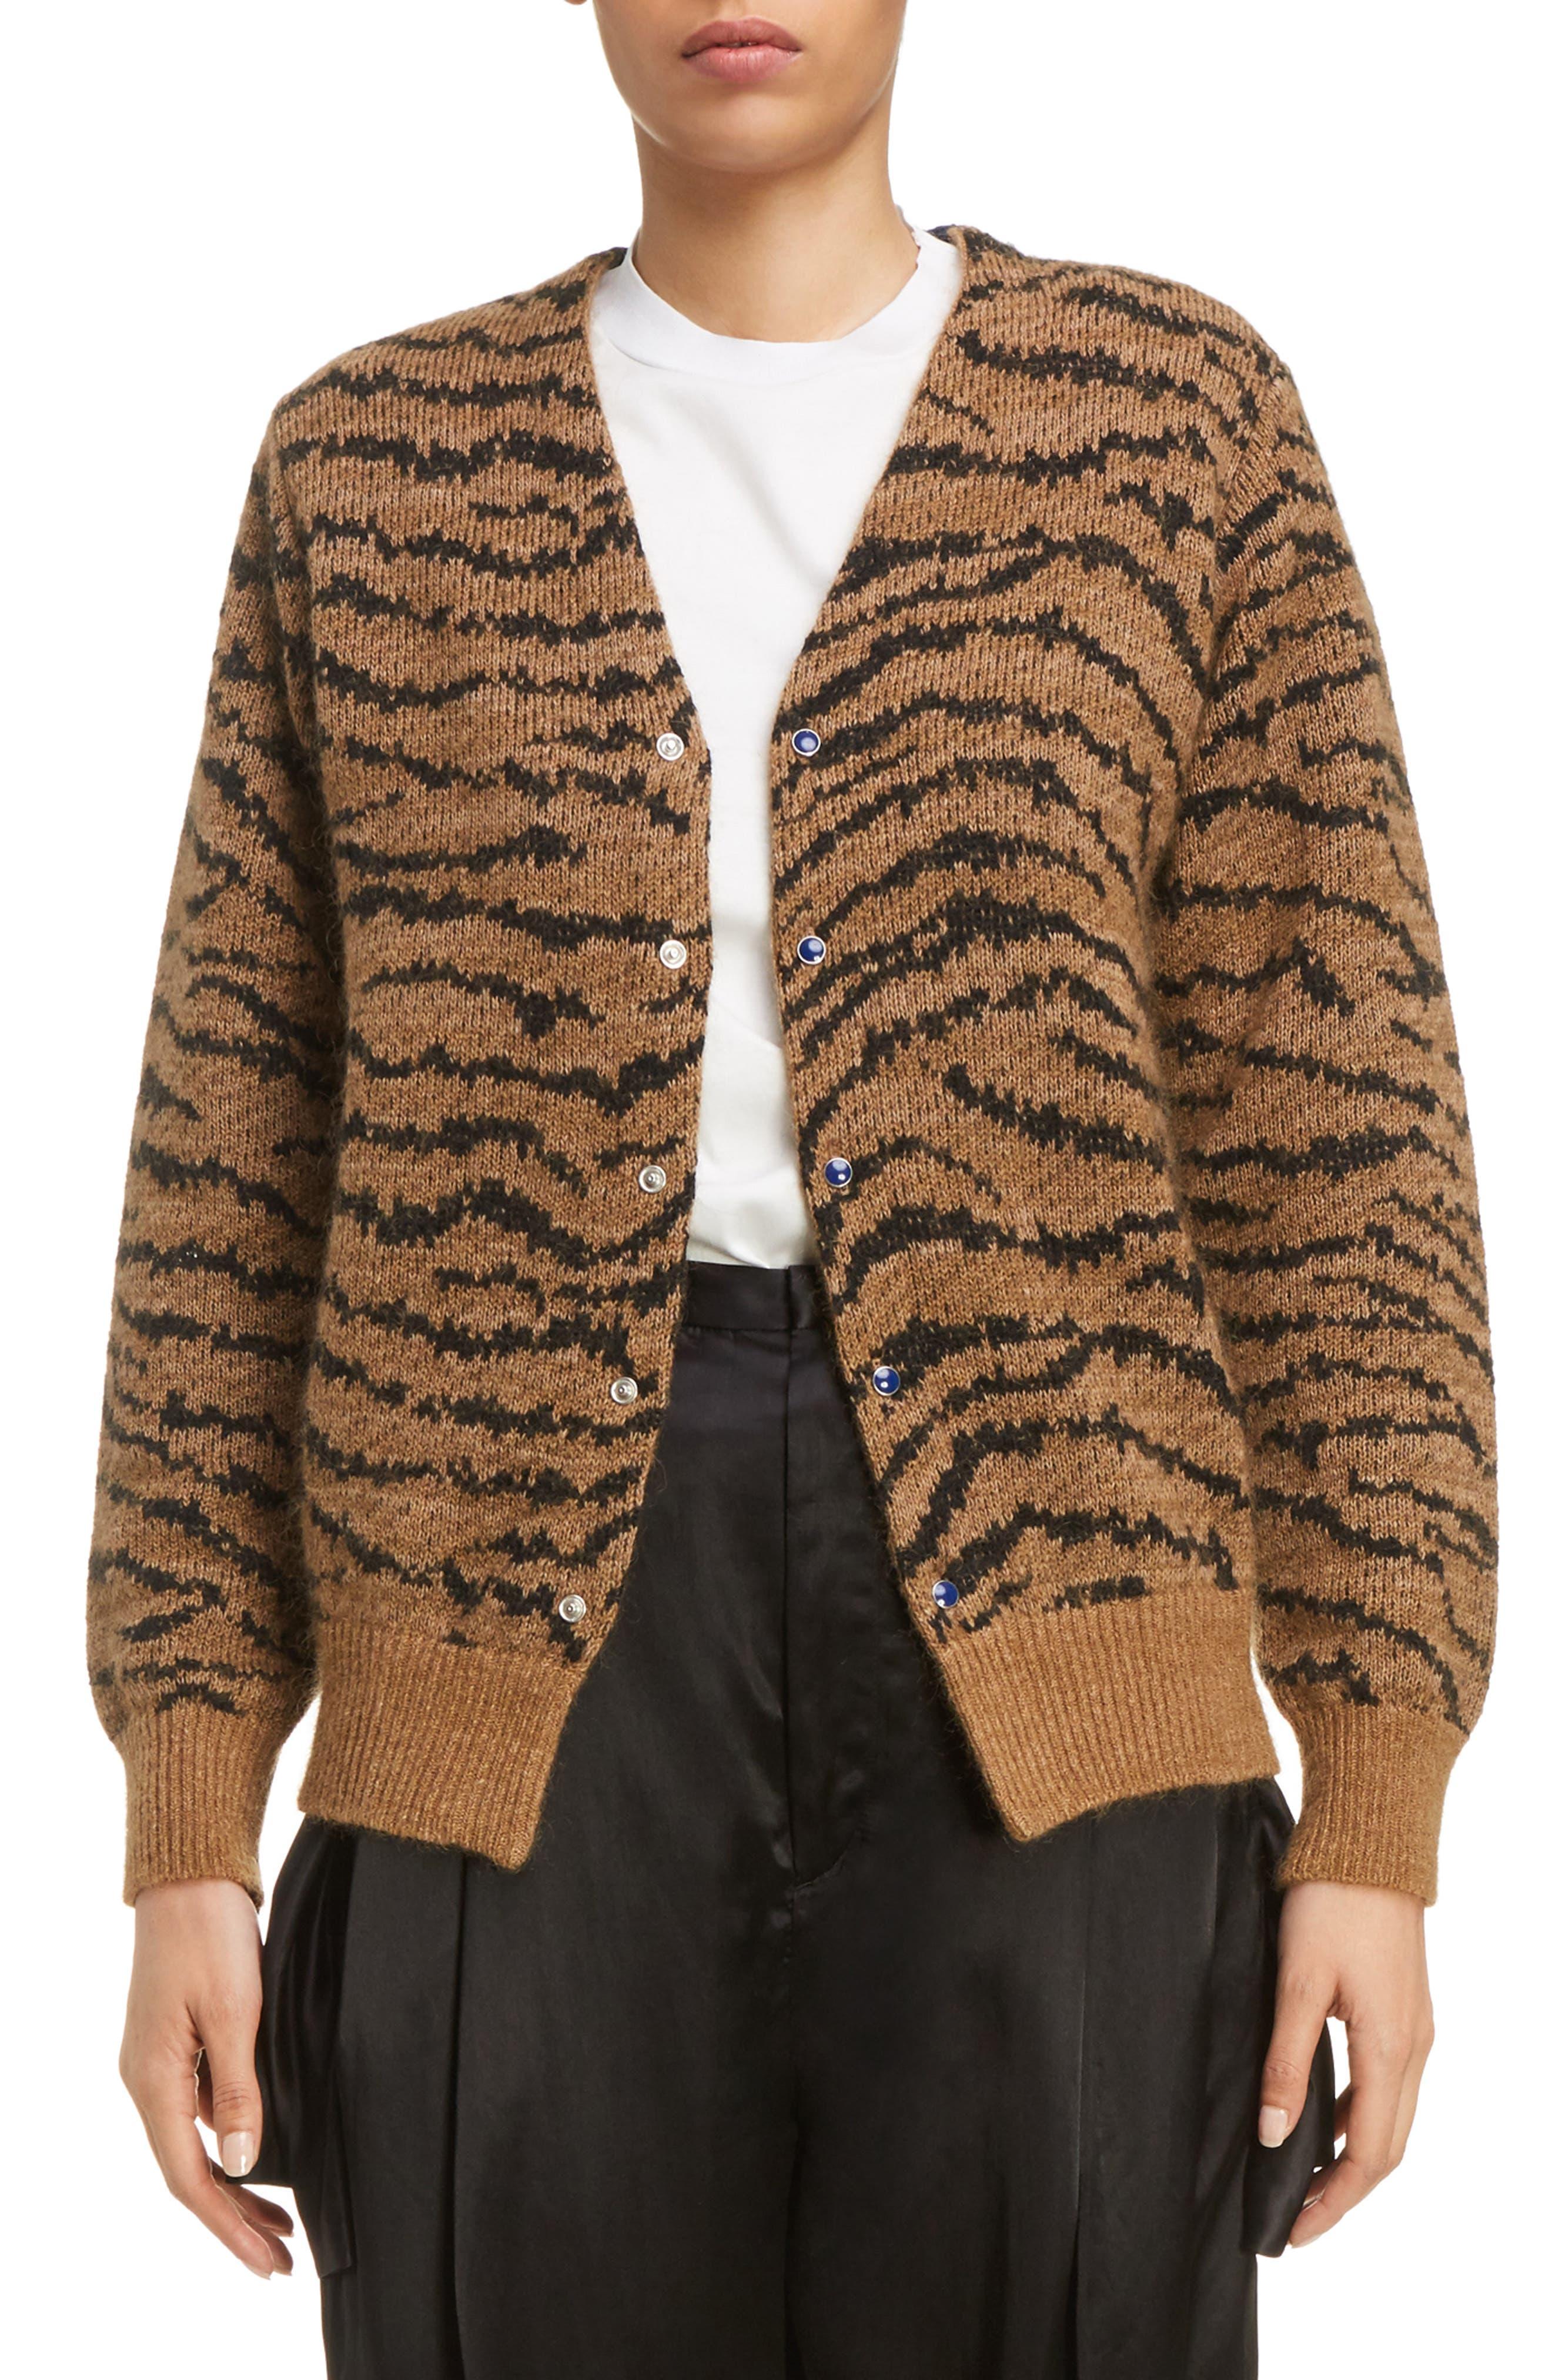 TOGA Tiger Jacquard Knit Button Cardigan